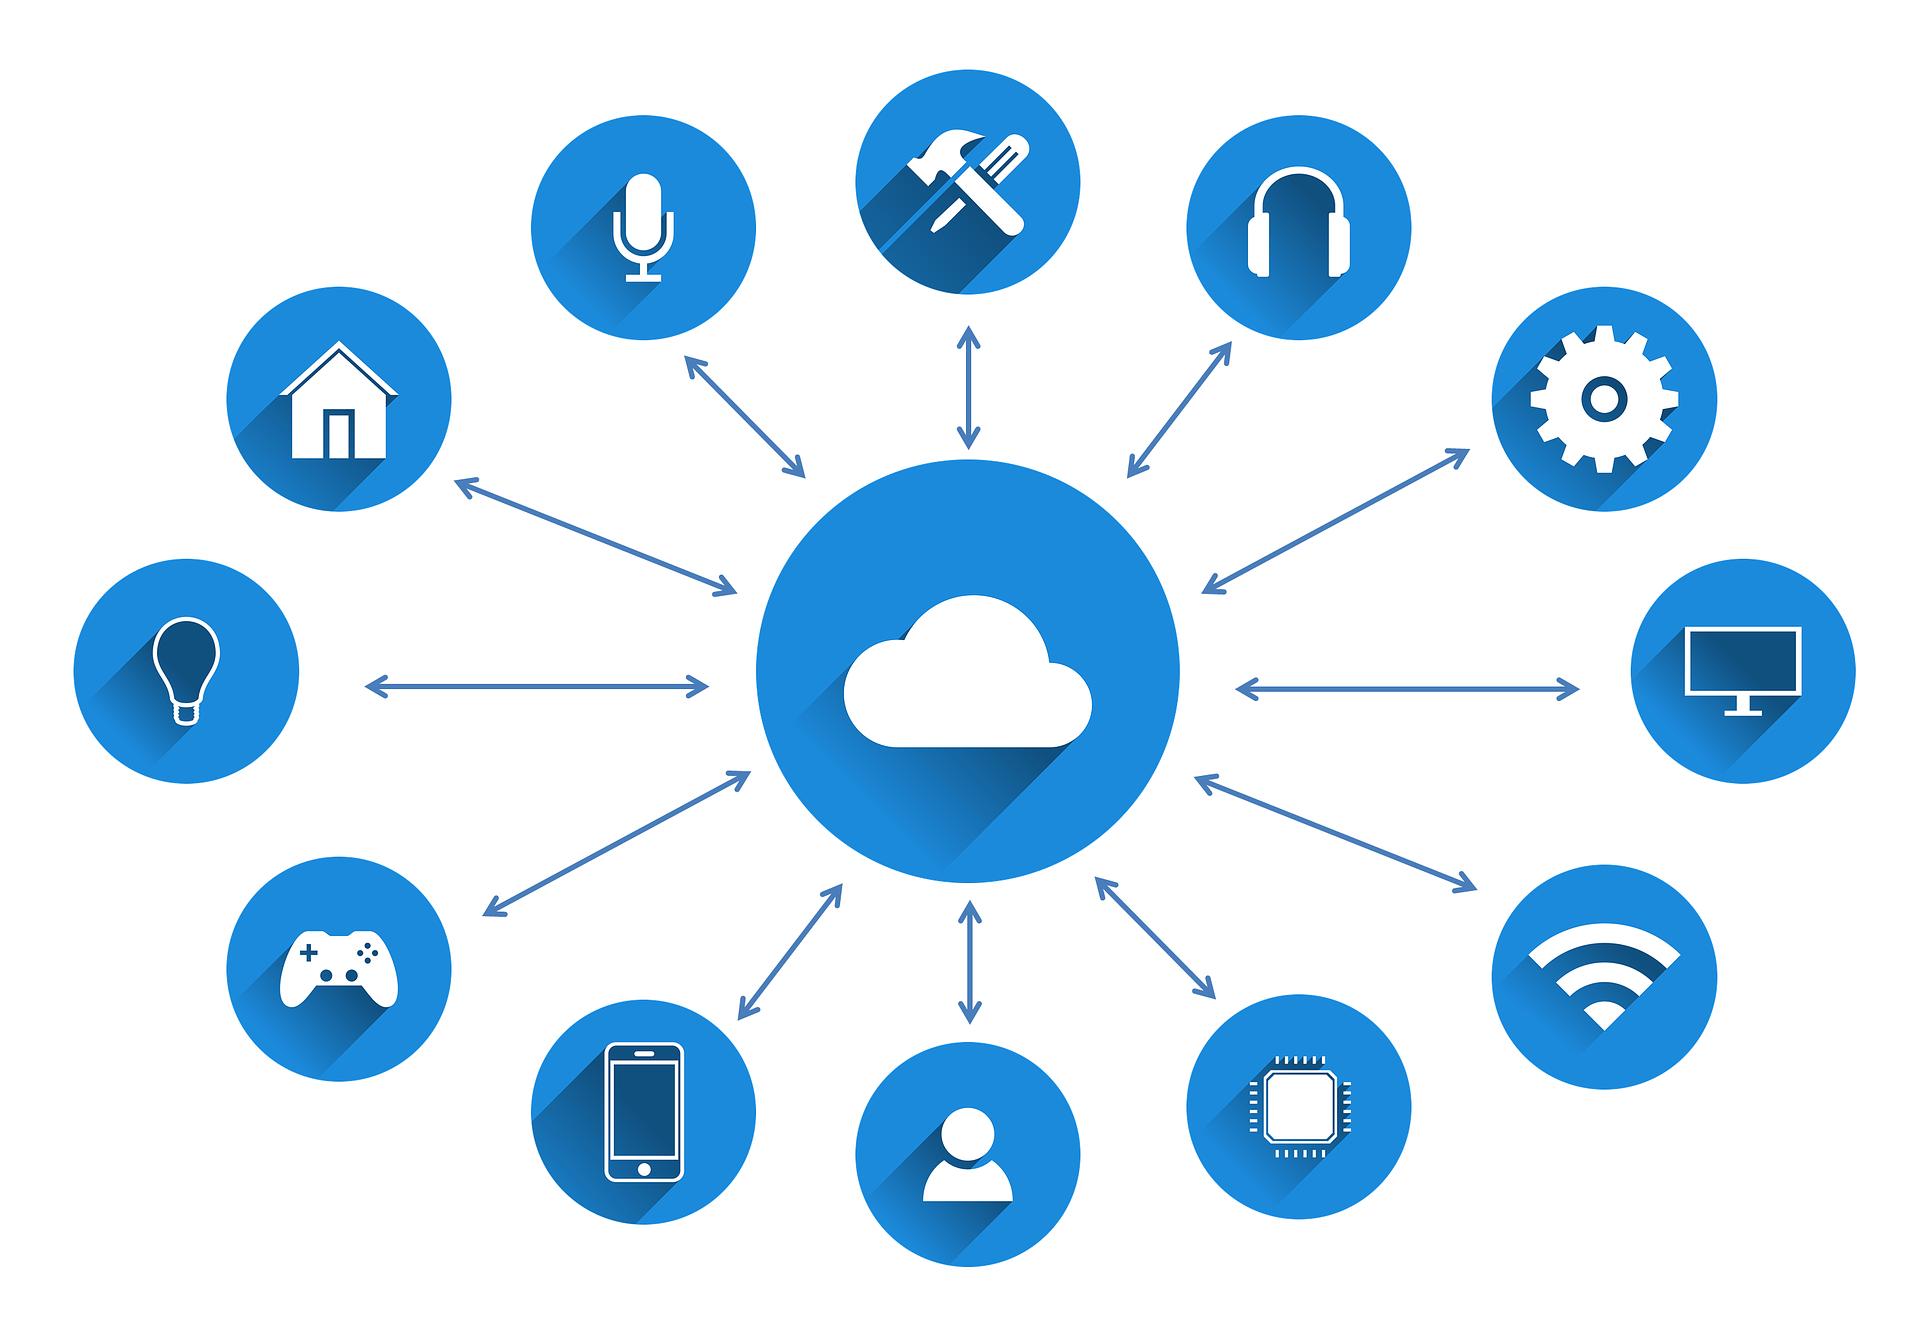 Descubra o que é IoT e como impacta no setor dos seguros